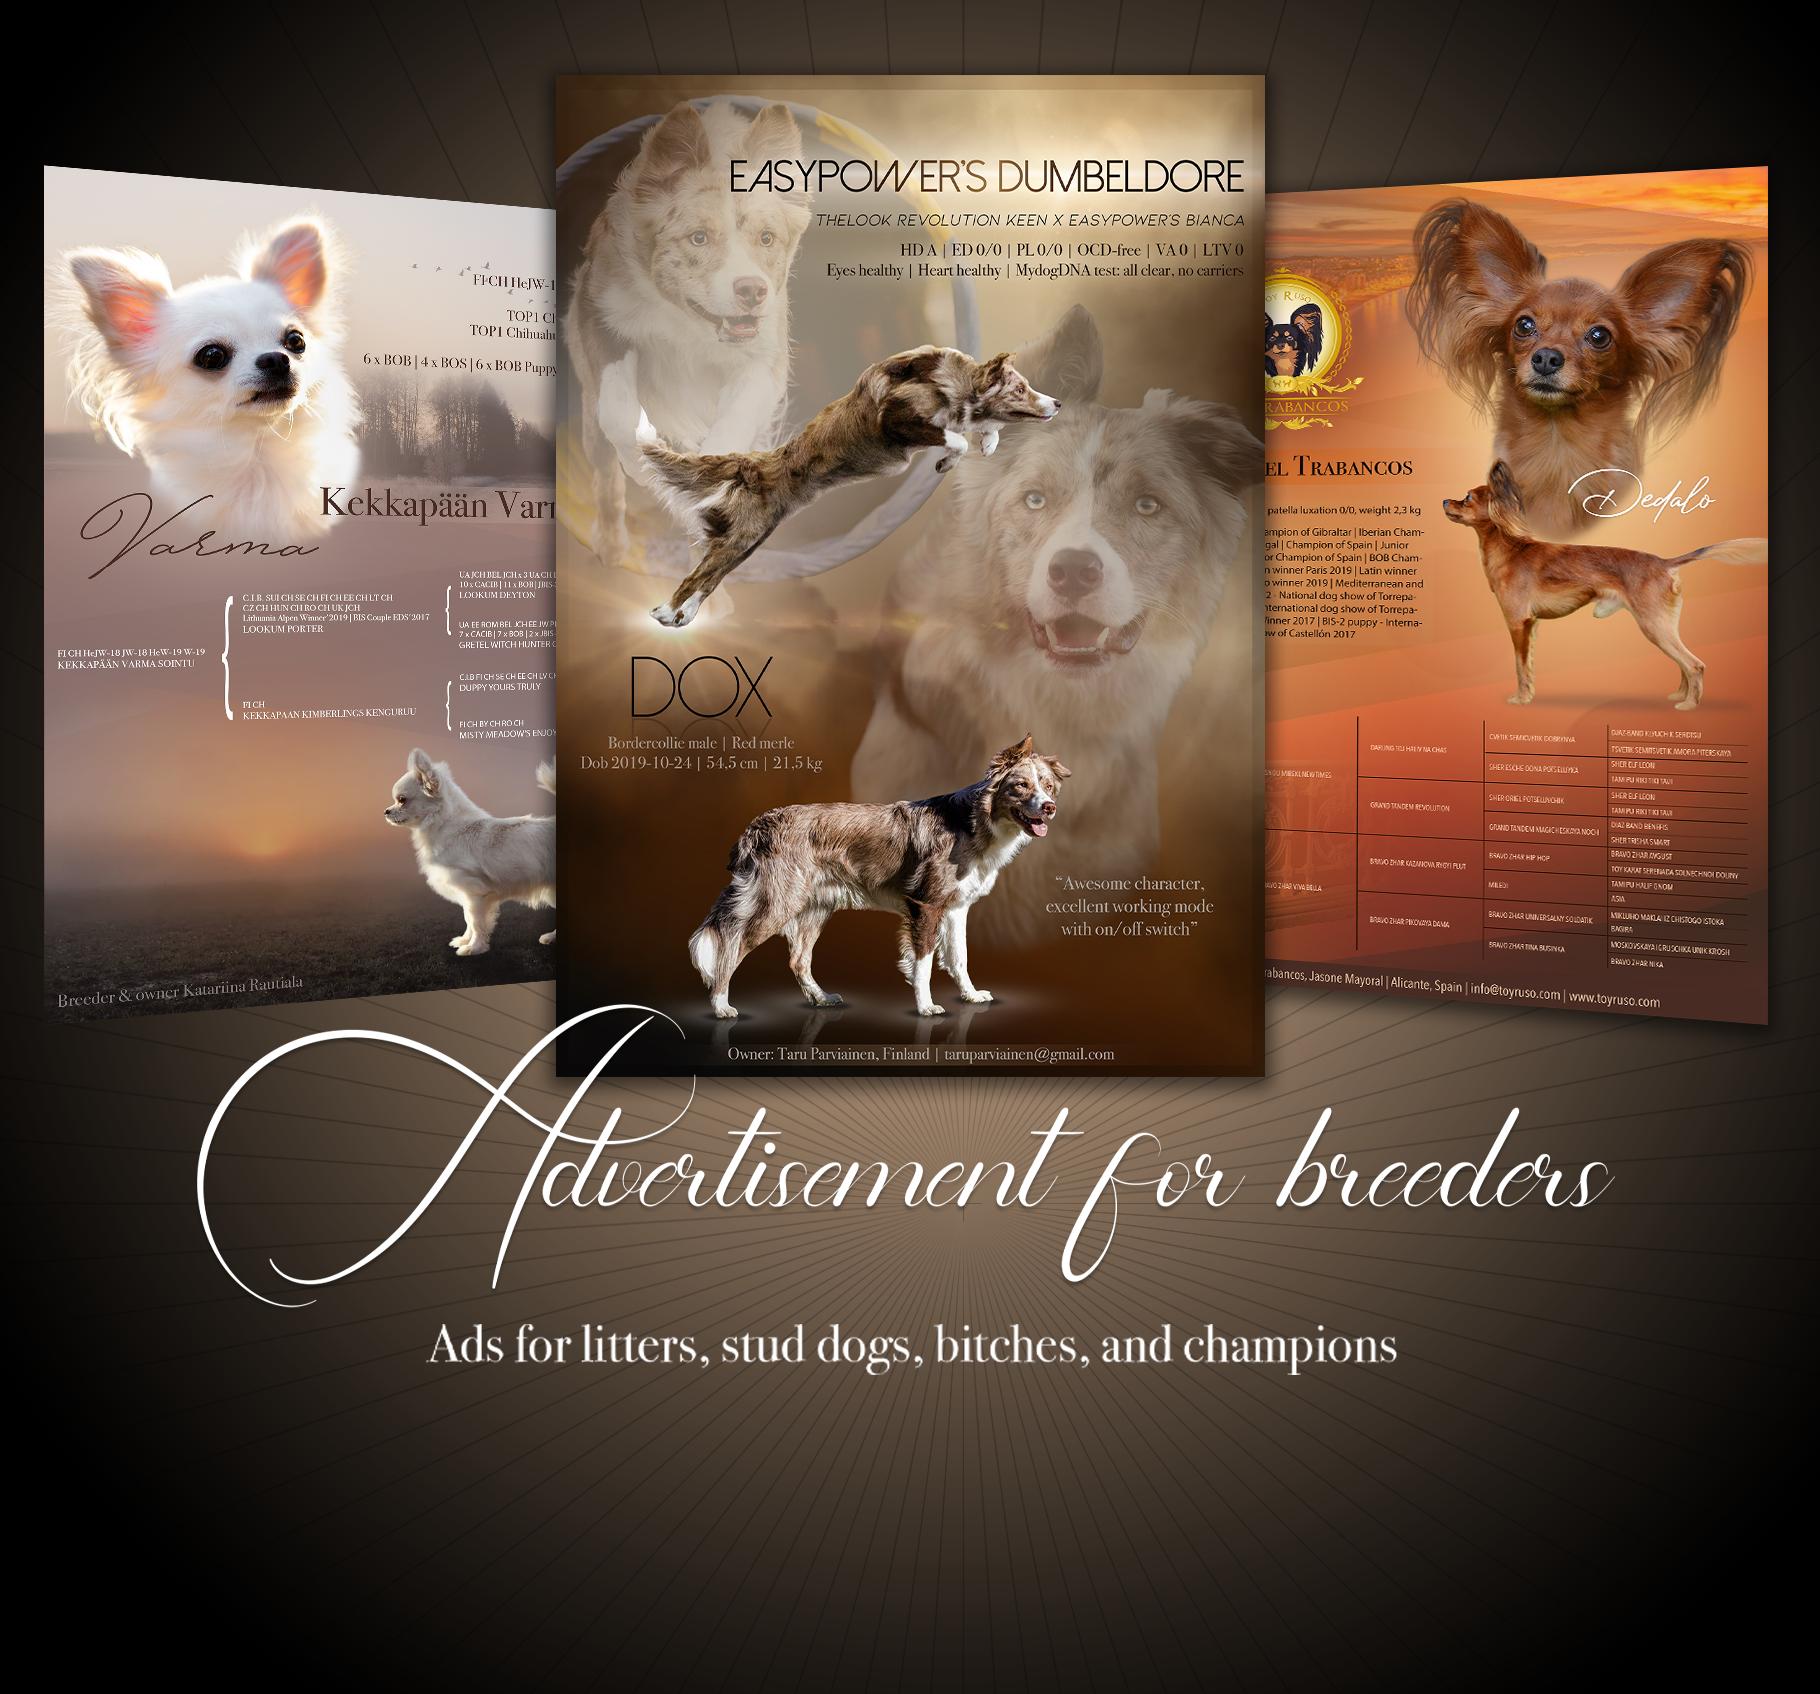 Graphic litter, stud dog, bitch, or champion advert - web version